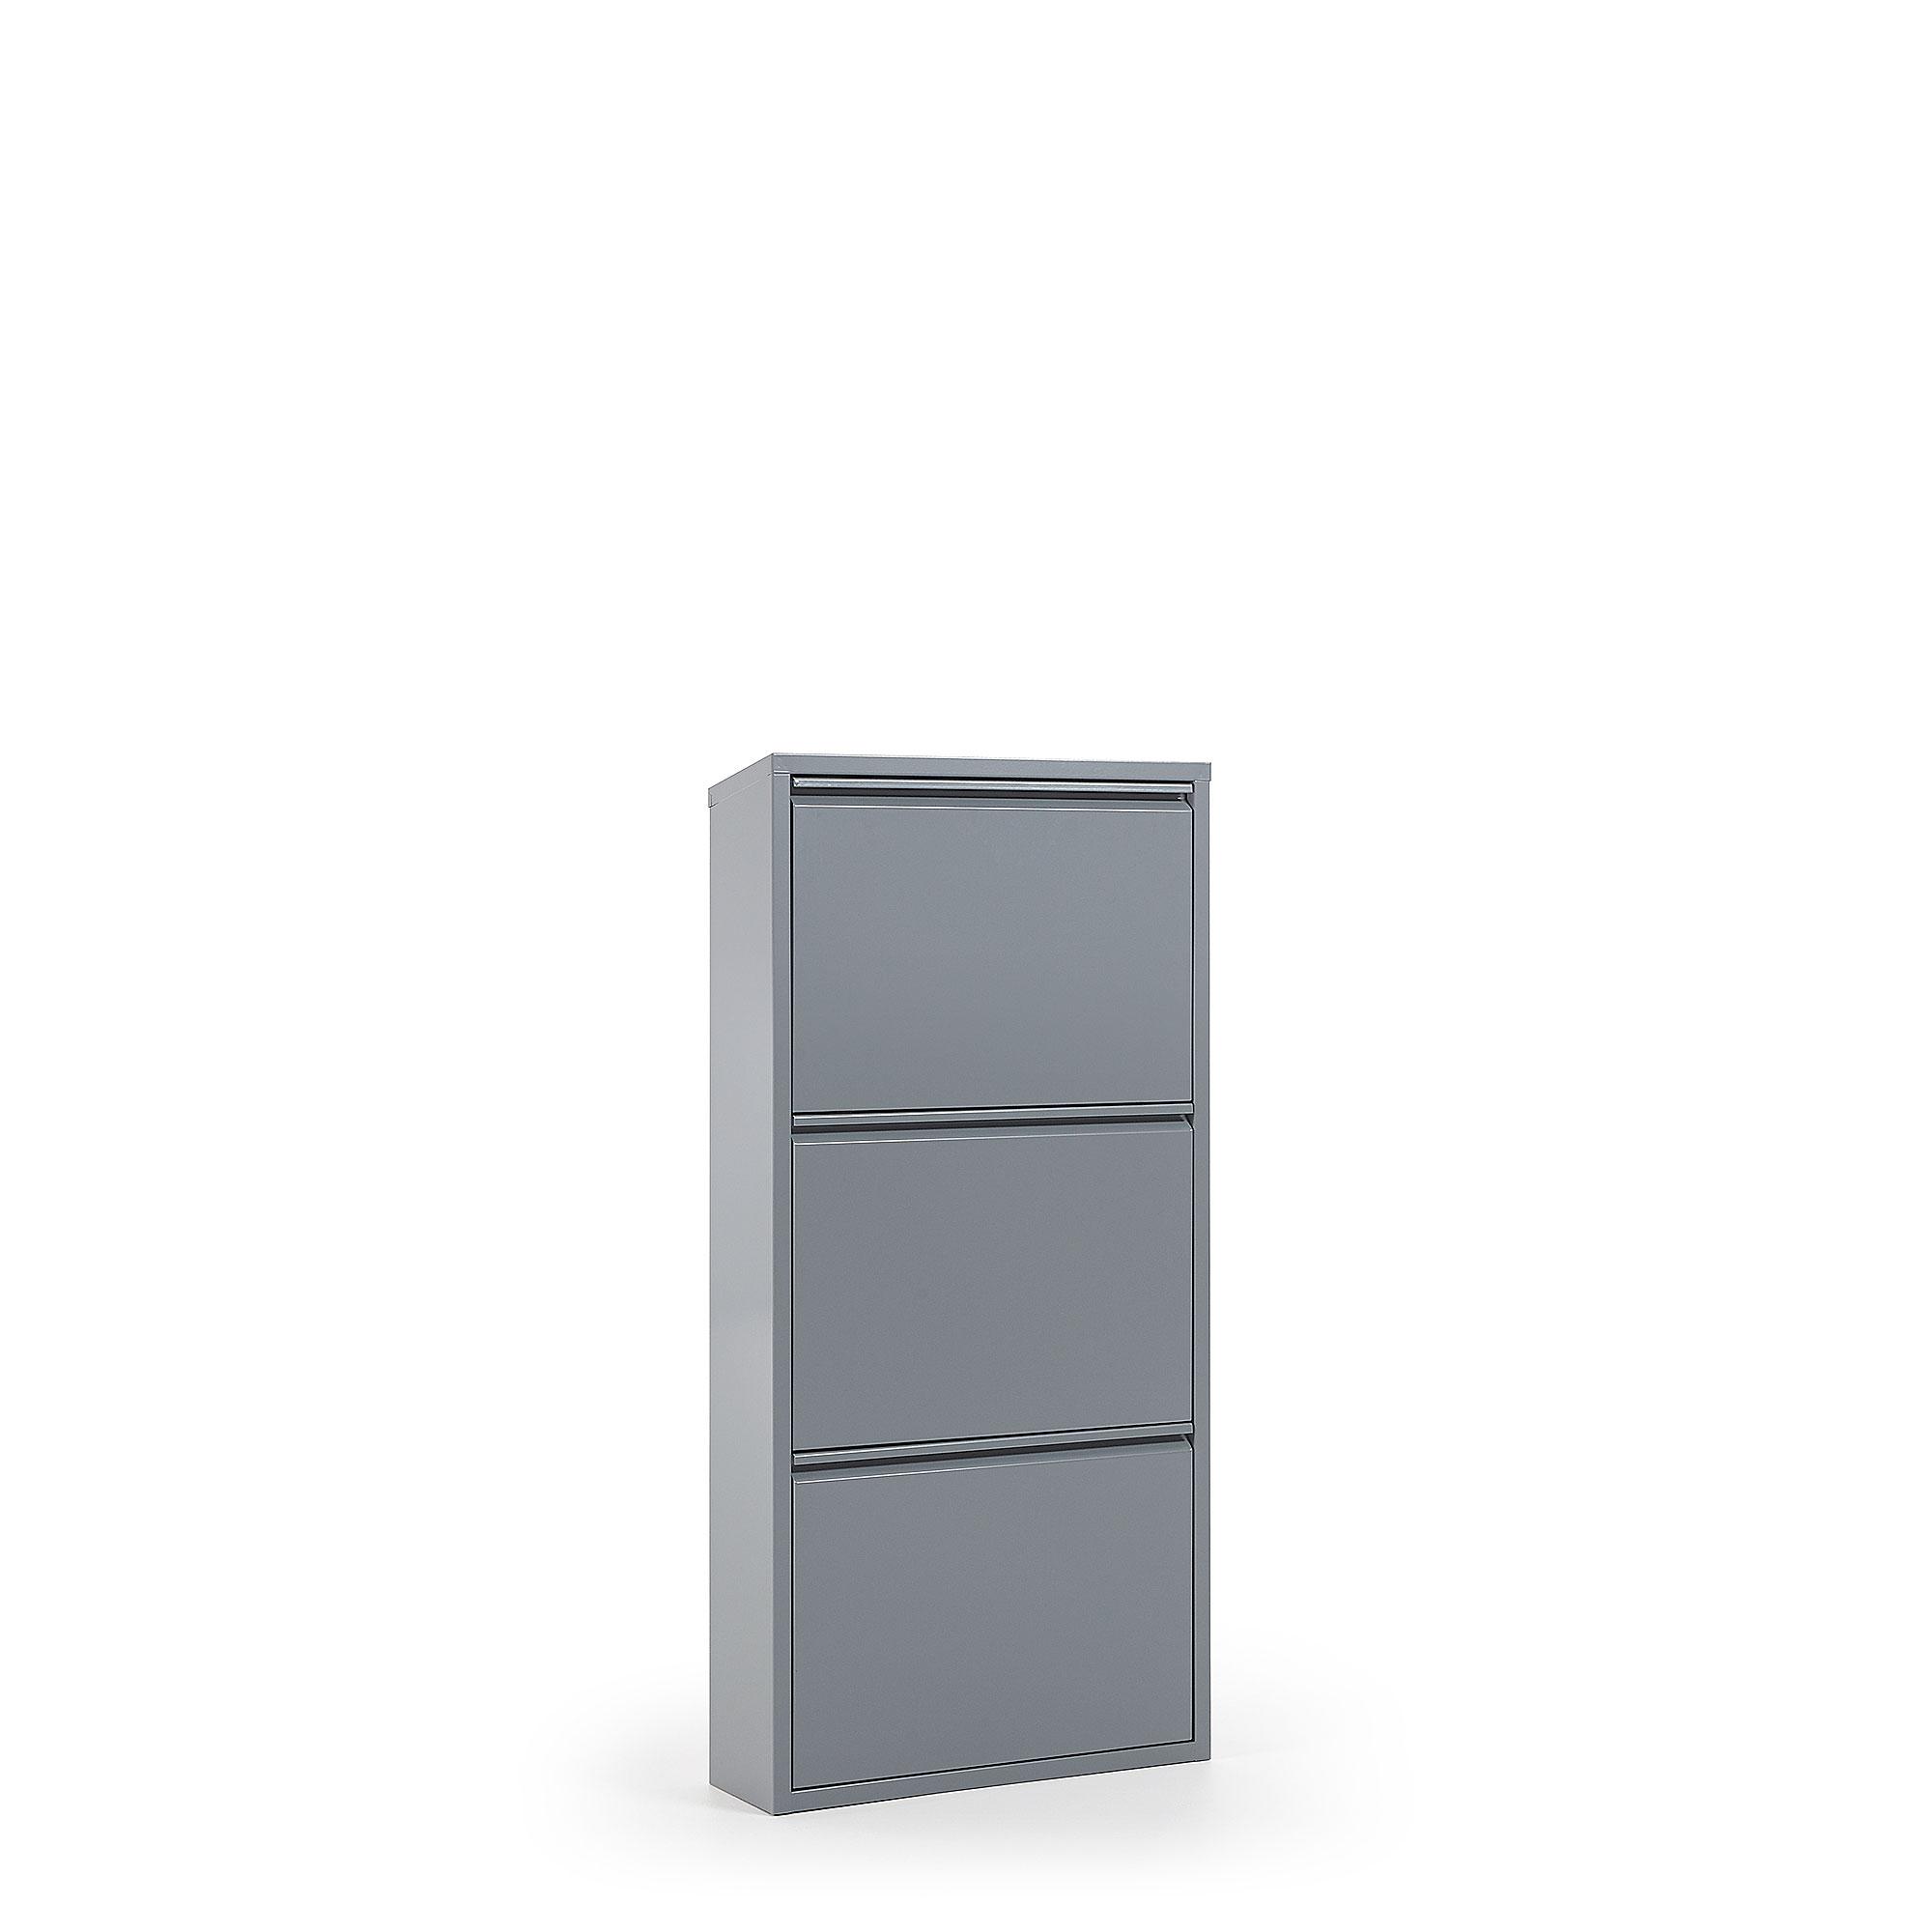 Kave Home - Ode Schuhregal 50 x 103 cm, 3-türig, grau | Flur & Diele > Schuhschränke und Kommoden > Schuhregal | Kave Home